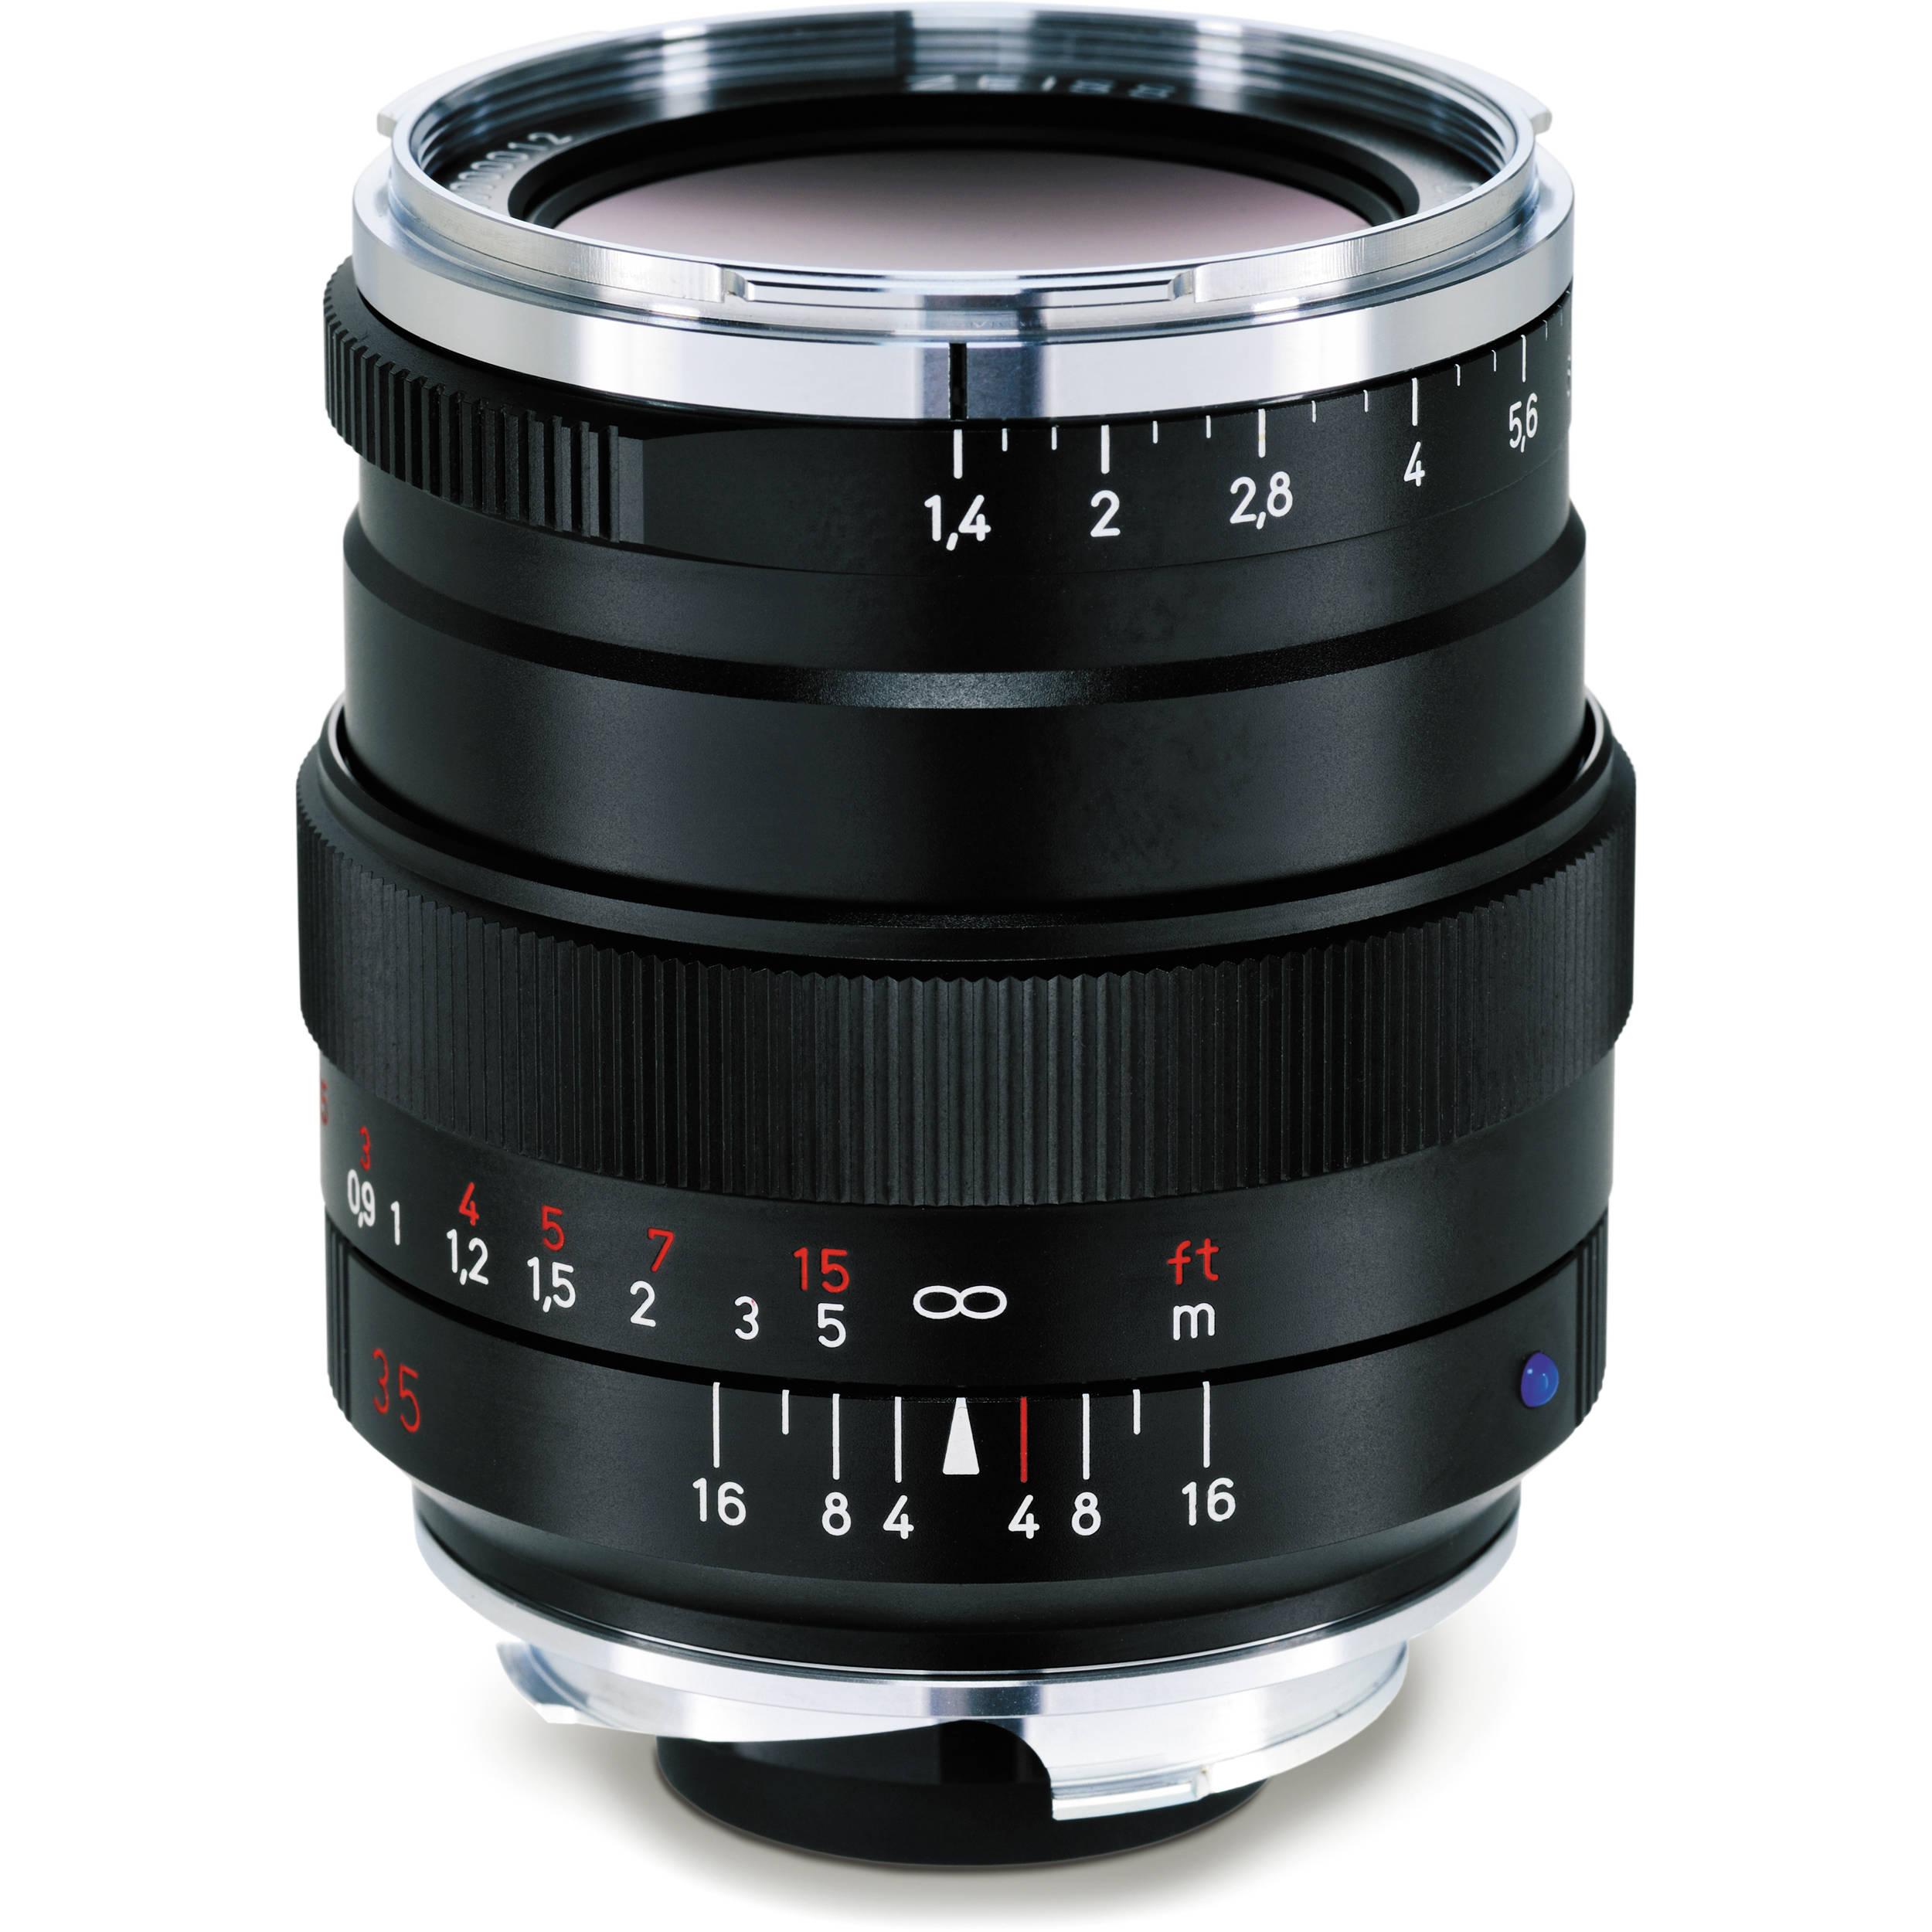 ZEISS Distagon T* 35mm f/1 4 ZM Lens (Black)